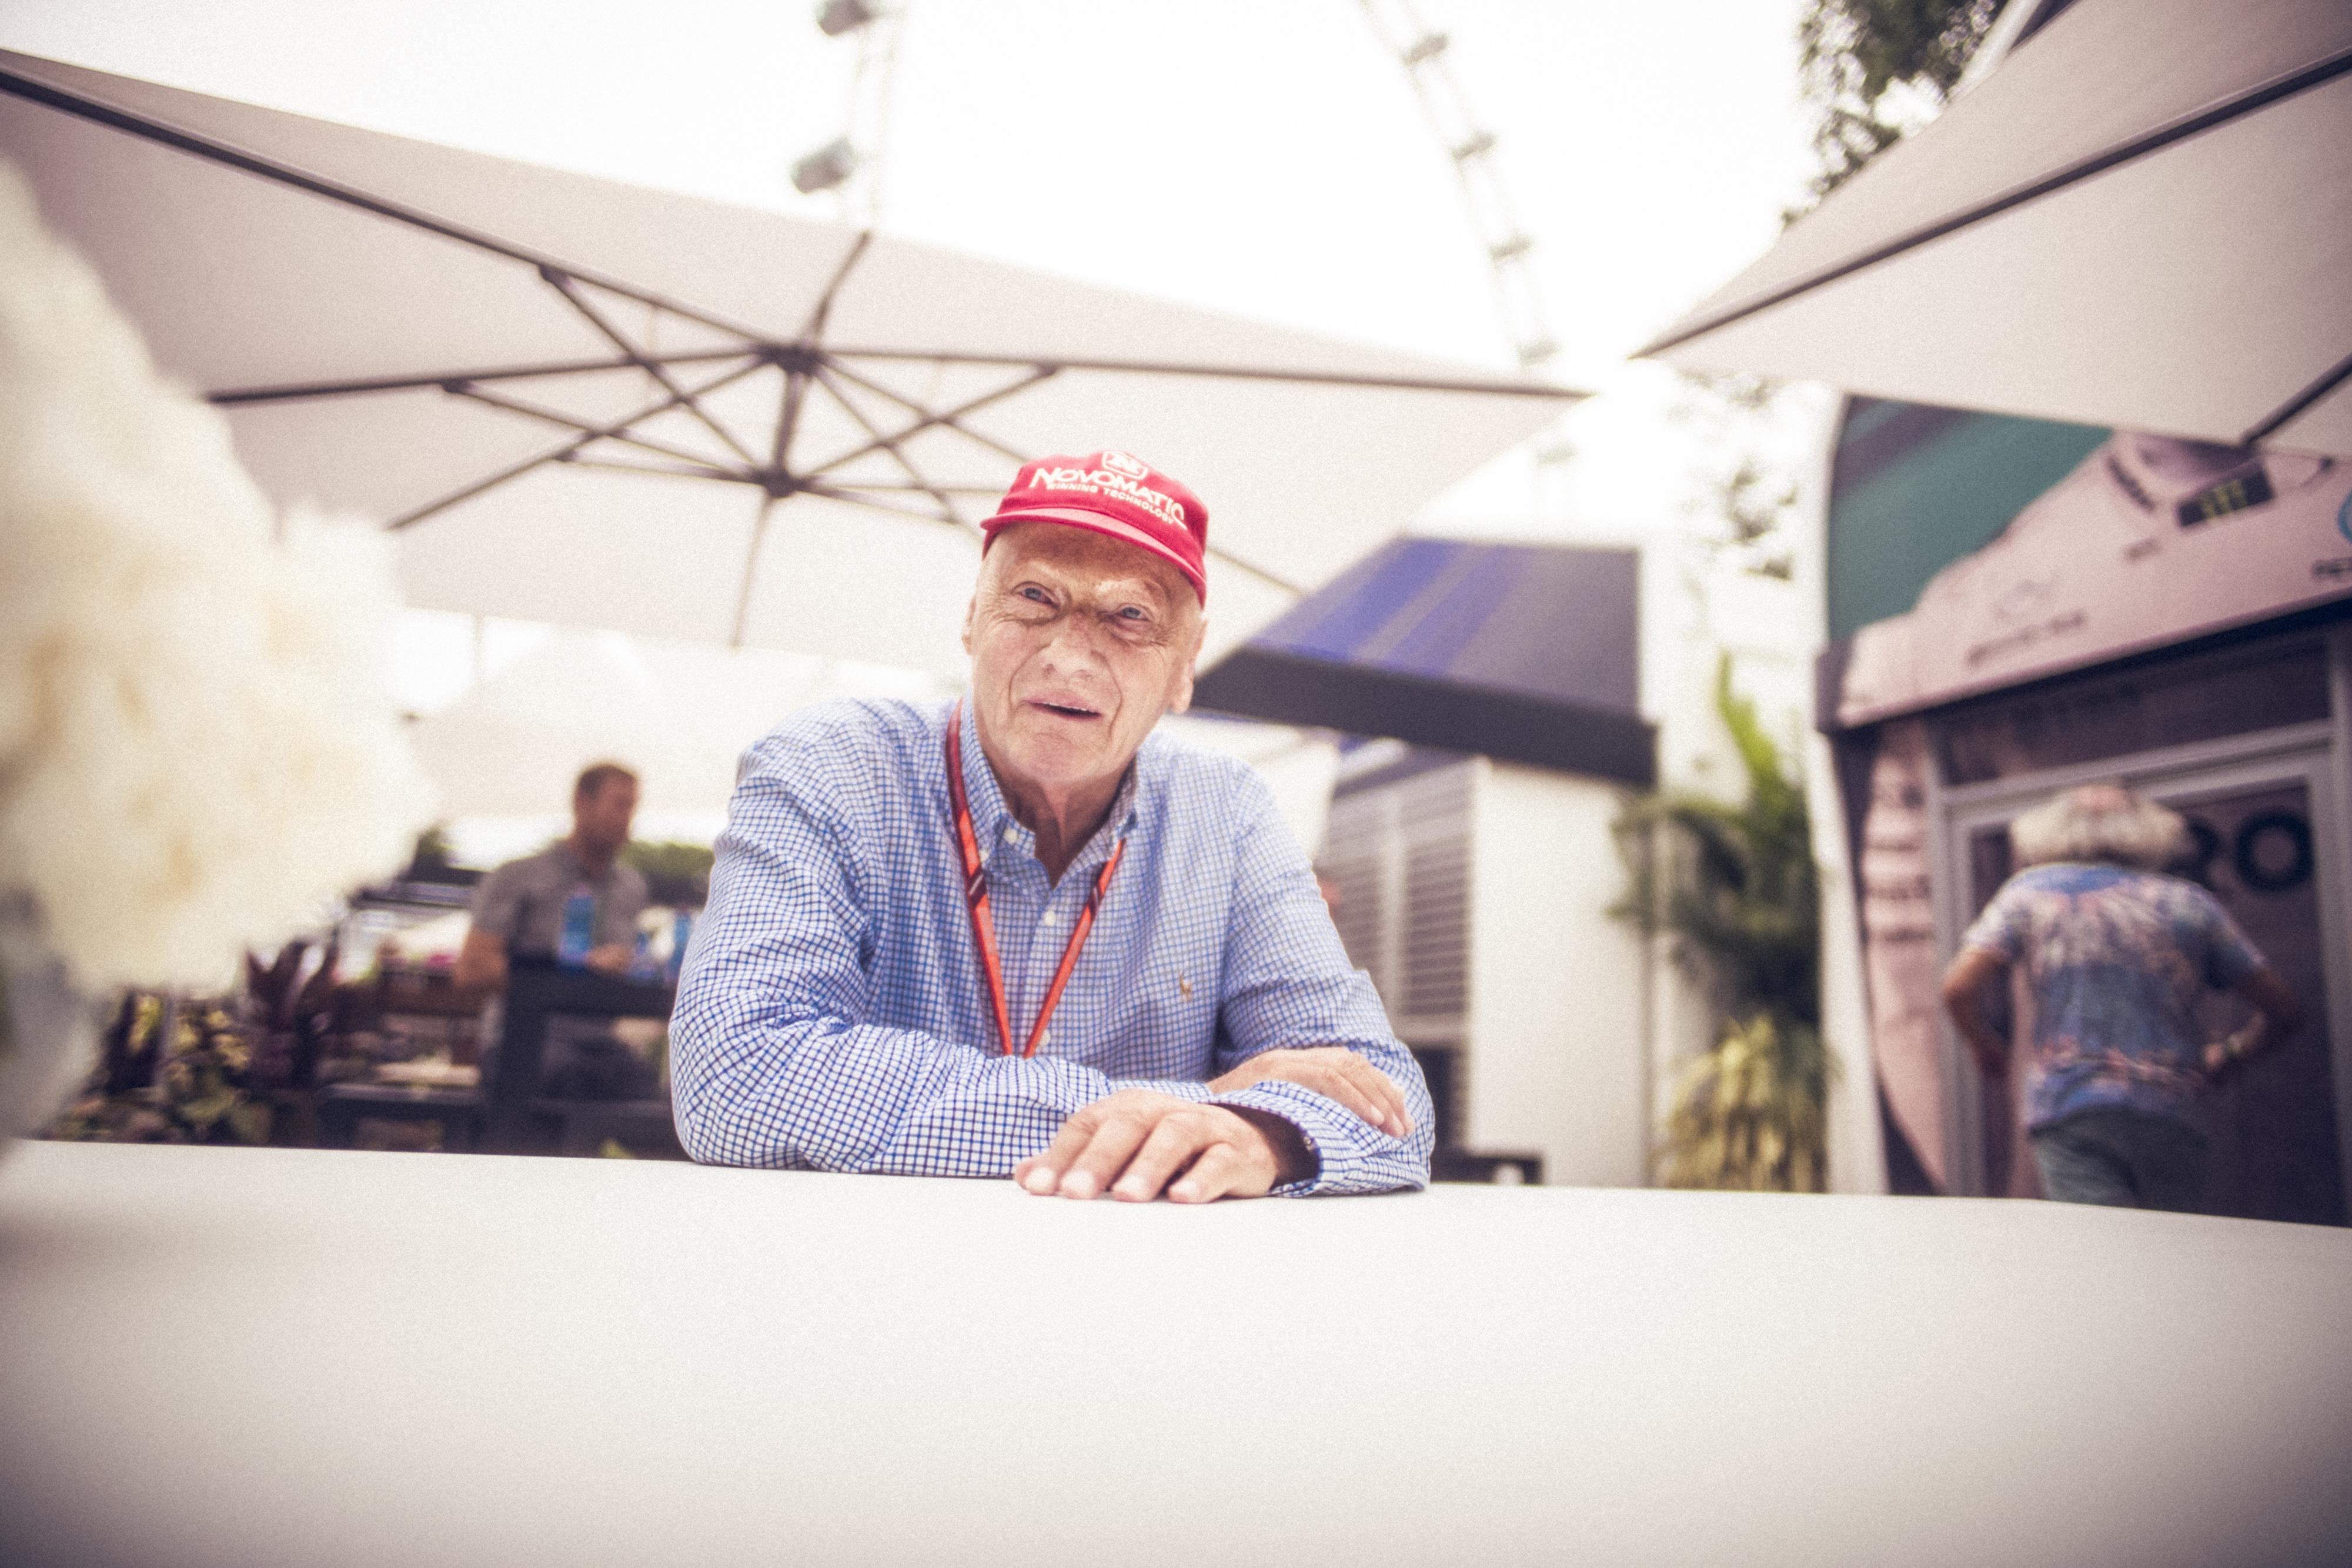 The Daimler Family mourns loss of Niki Lauda